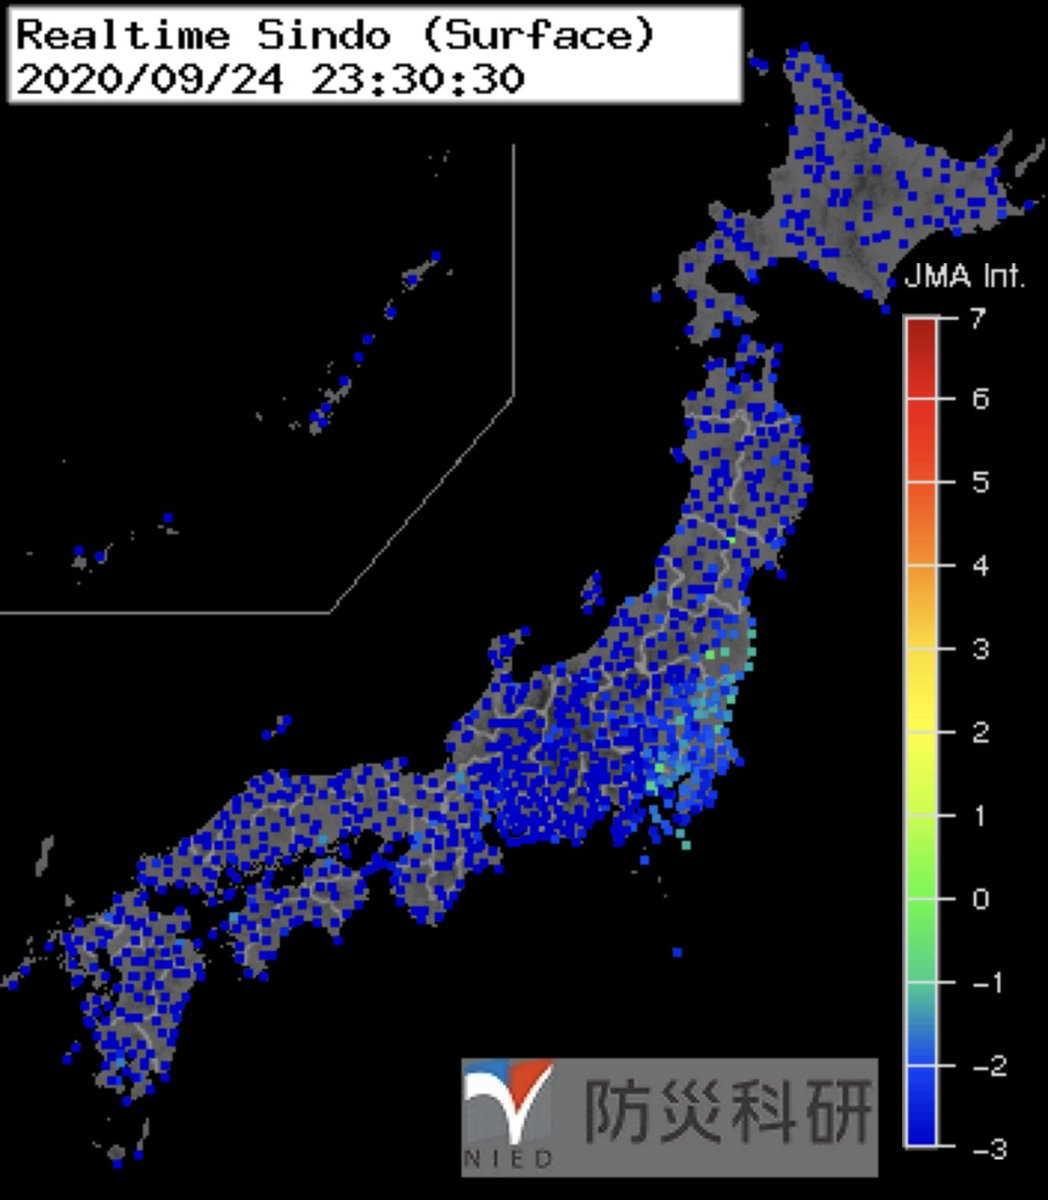 RT @nekotora_japan: 異常震域⁉️ https://t.co/0GI7VrPPOP